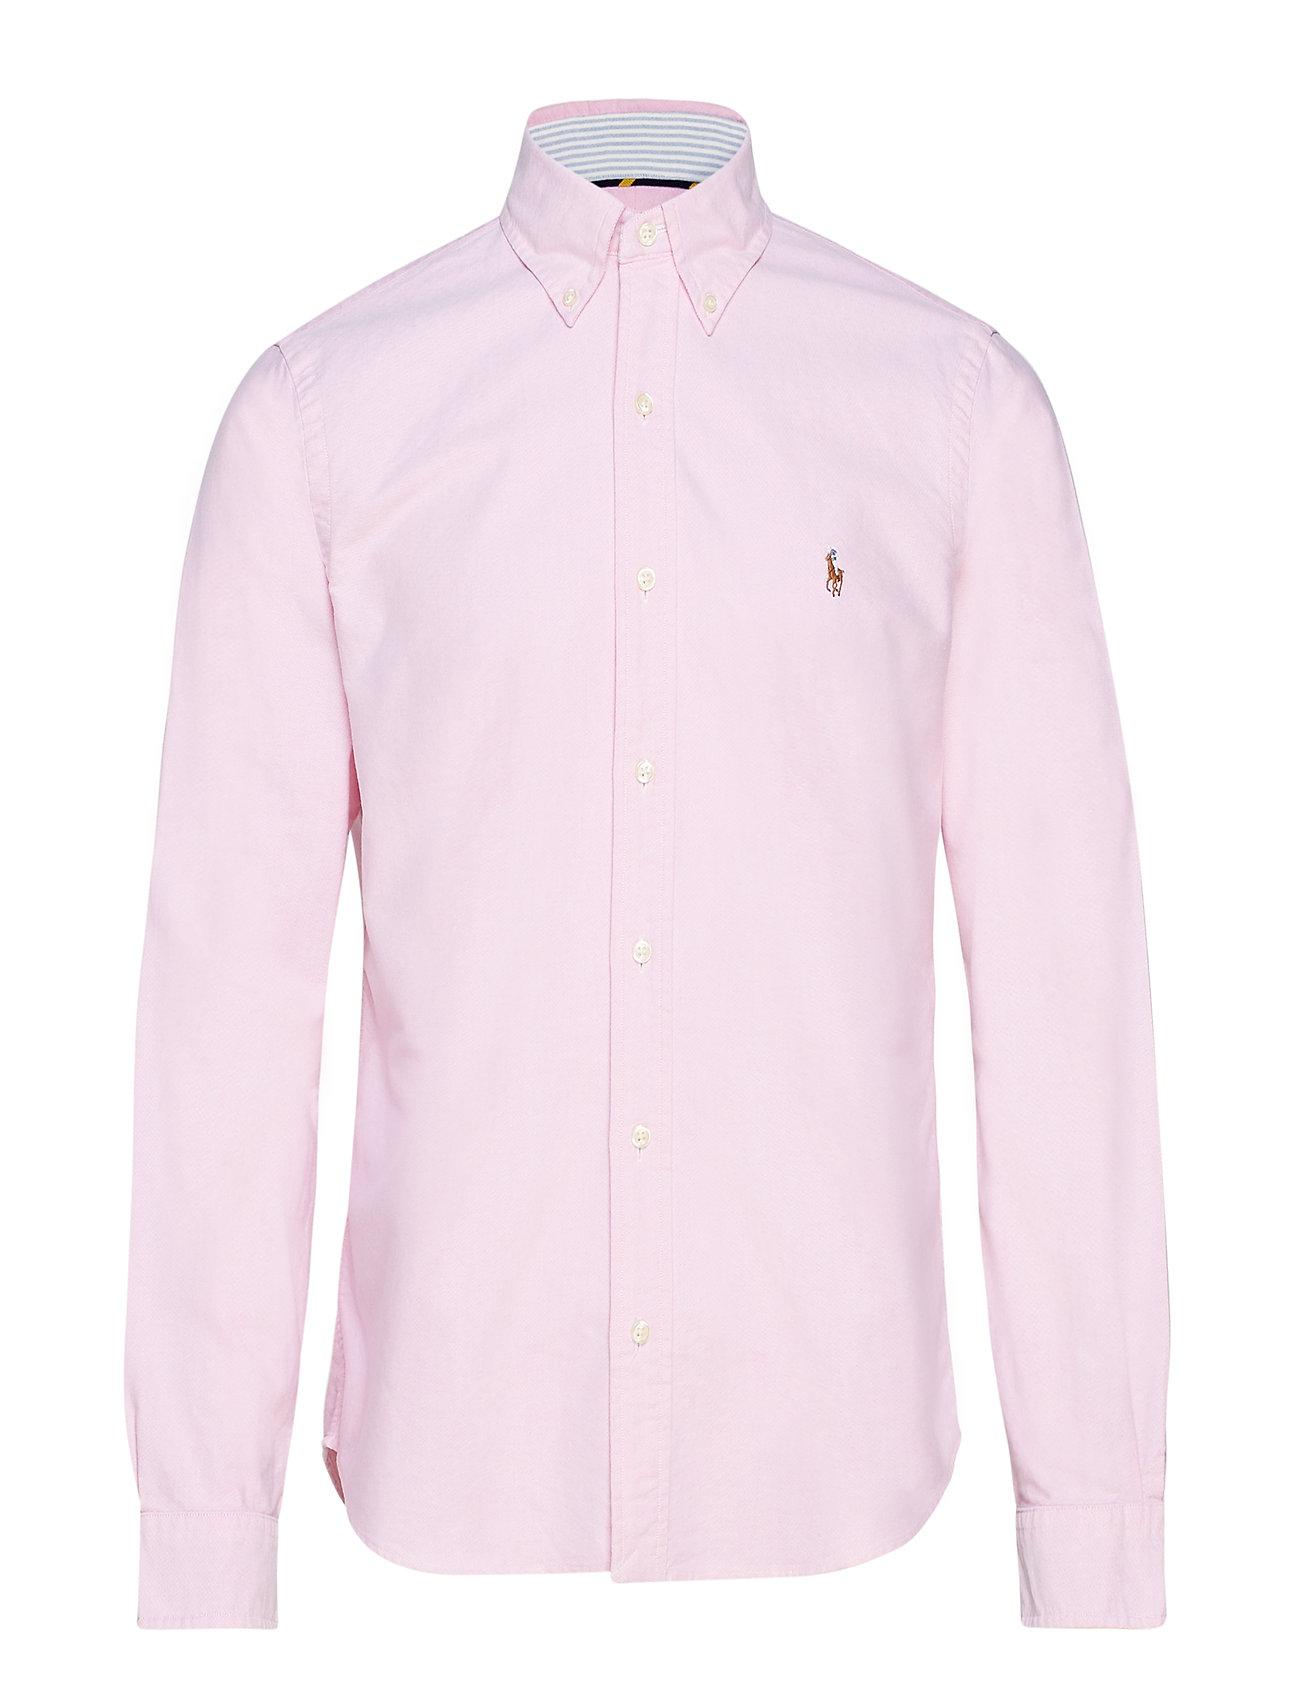 Oxford-bd Ppc Spt (New Rose) (99.95 €) - Polo Ralph Lauren - Shirts ... 930fe5a99a4